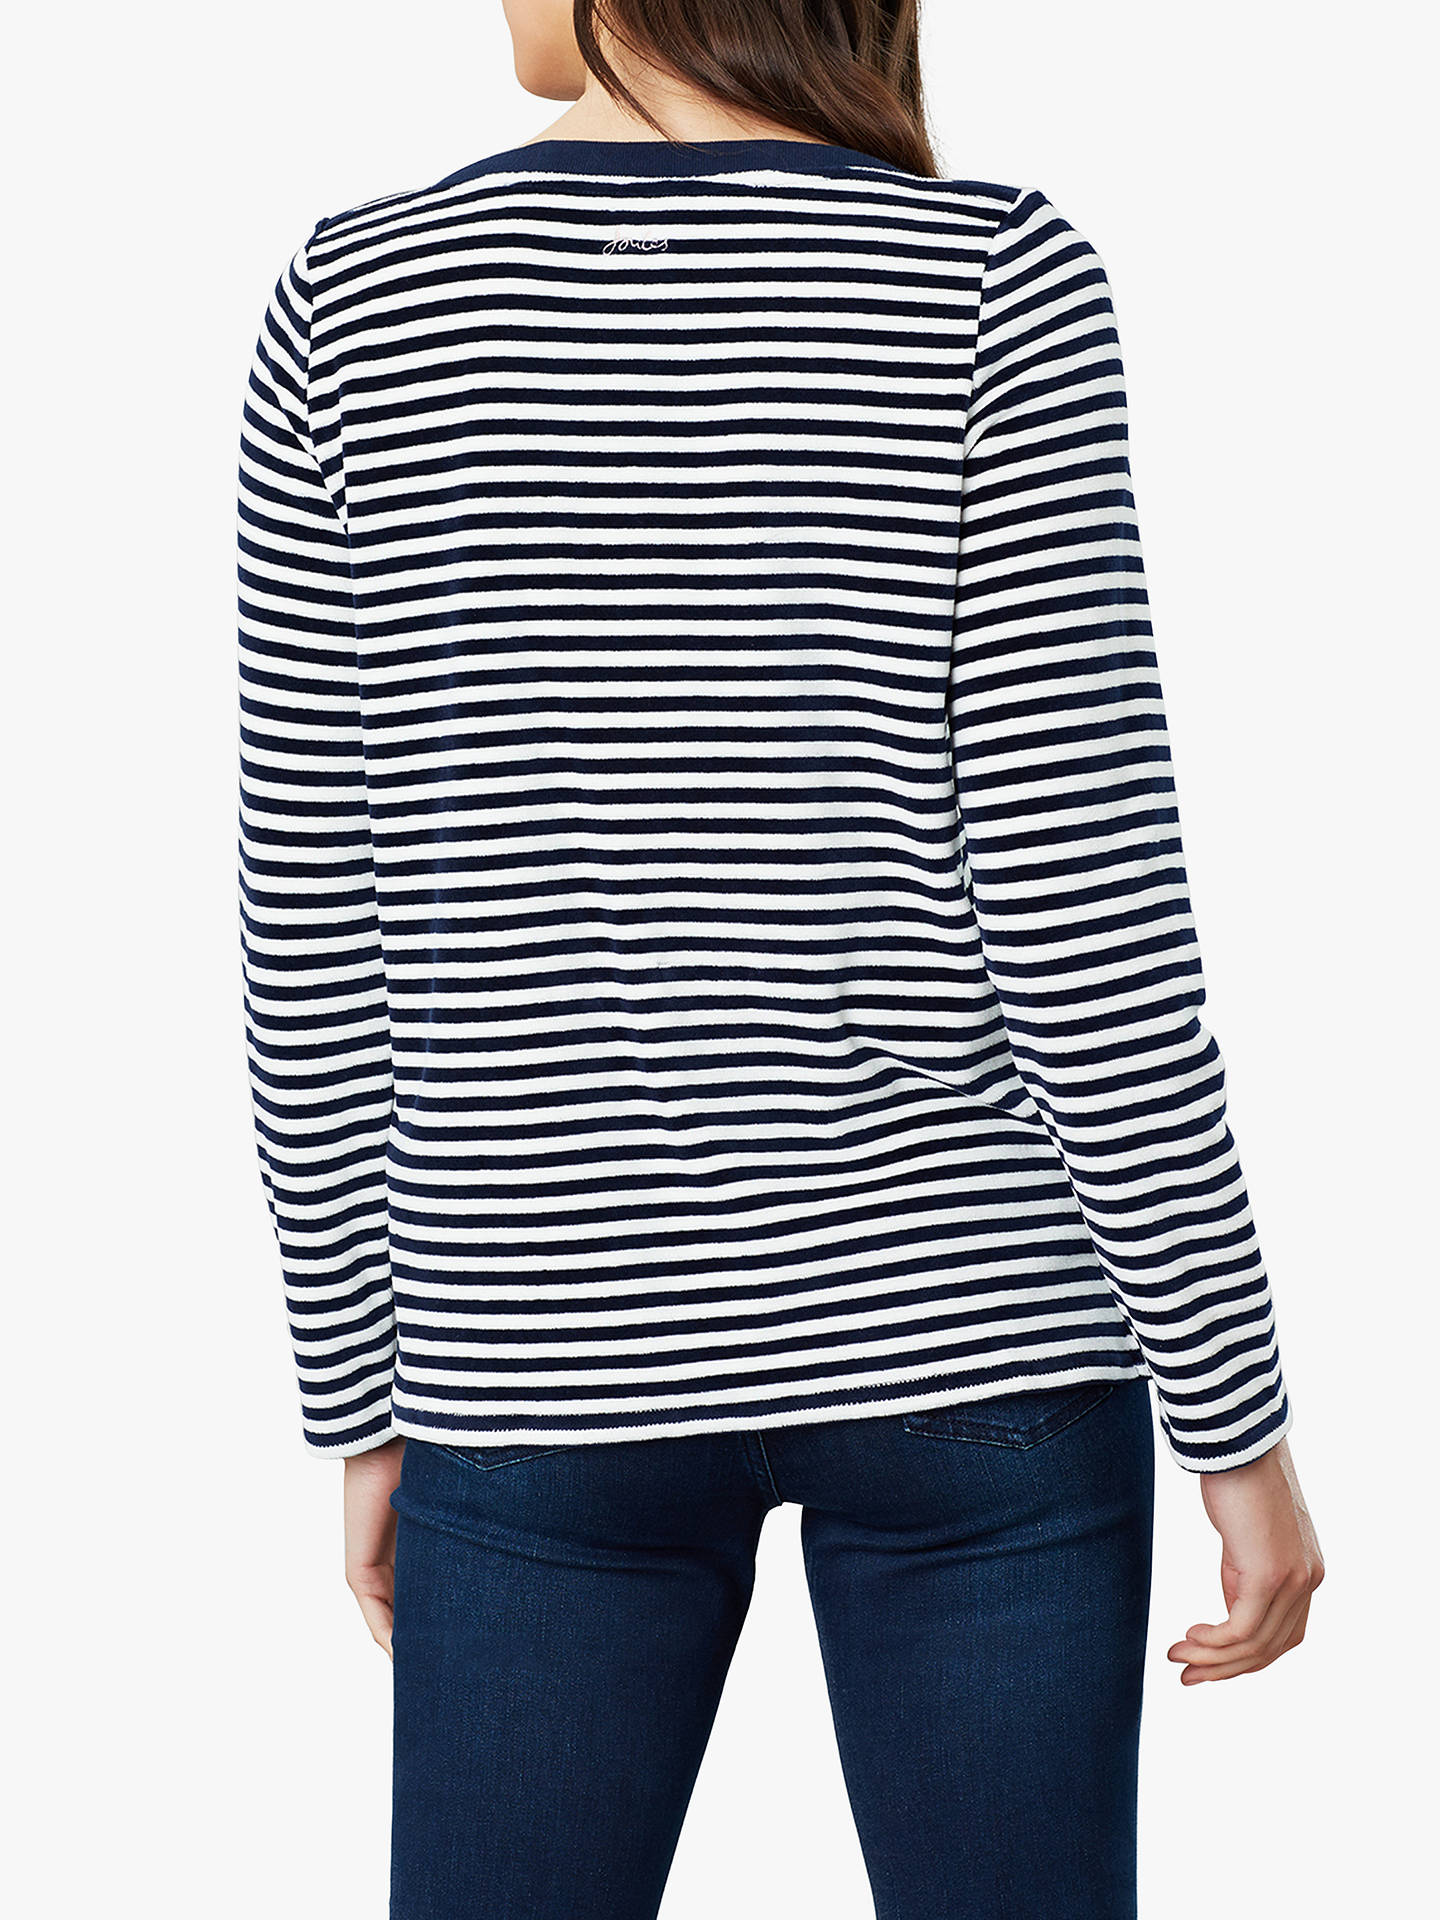 Joules Womens Esme Slash Neck Jersey Top Shirt NAVY CREAM STRIPE